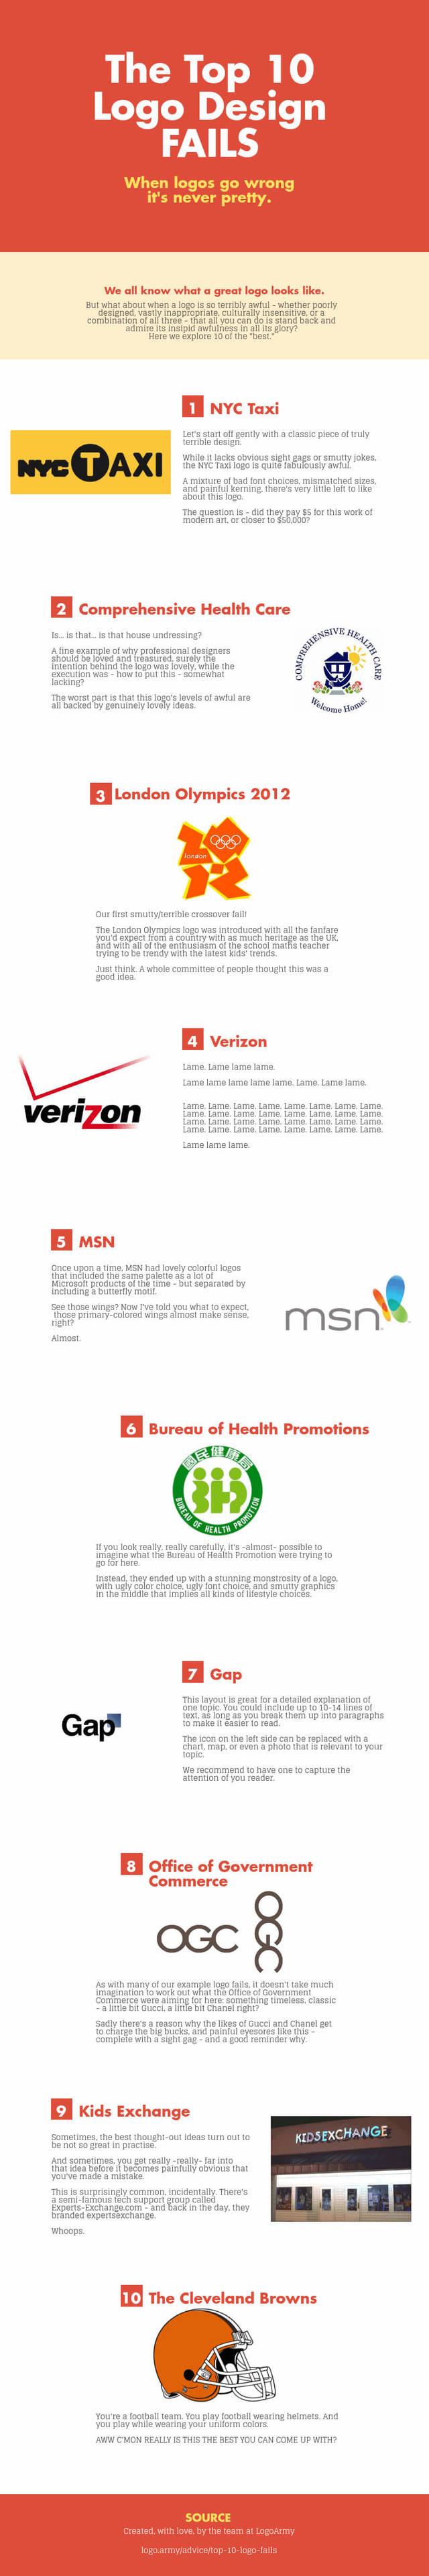 Top 10 logo fails infographic